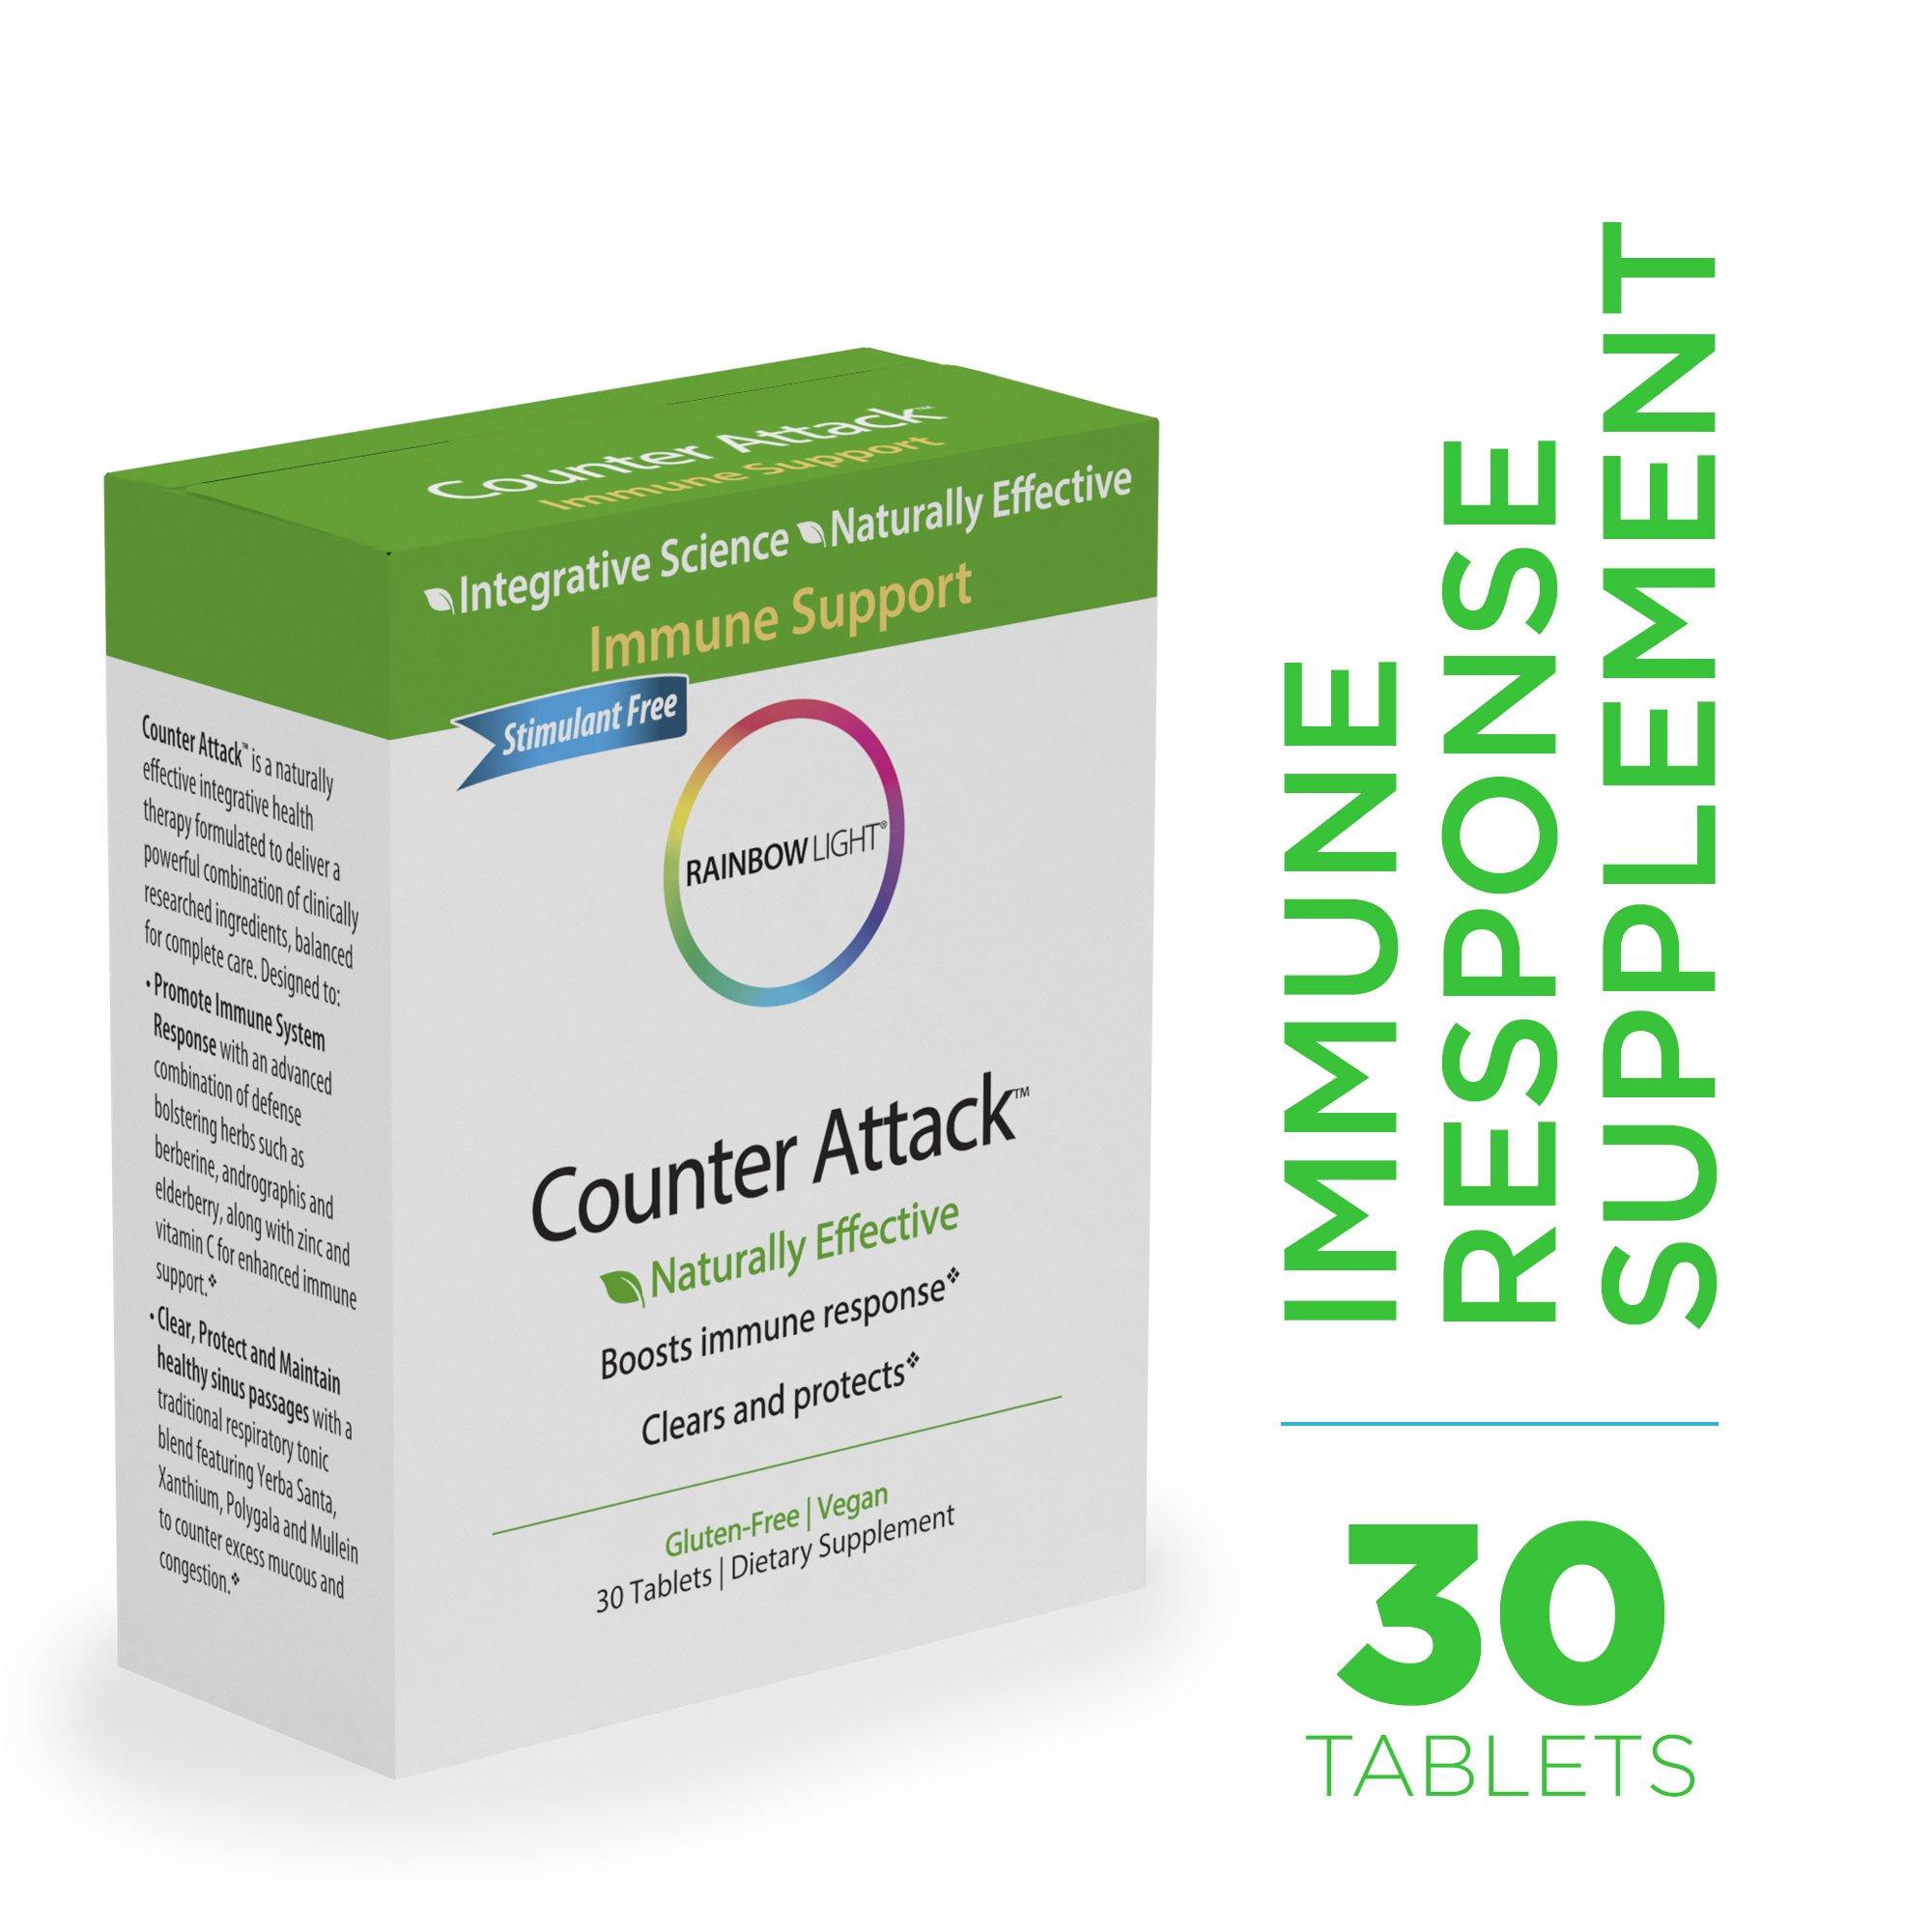 Holistic Ester C Kids 30 Tab Harga Terkini Dan Terlengkap Holisticare Super Tablet Rainbow Light Counter Attack Vitamin And Zinc Supplement Vegan Gluten